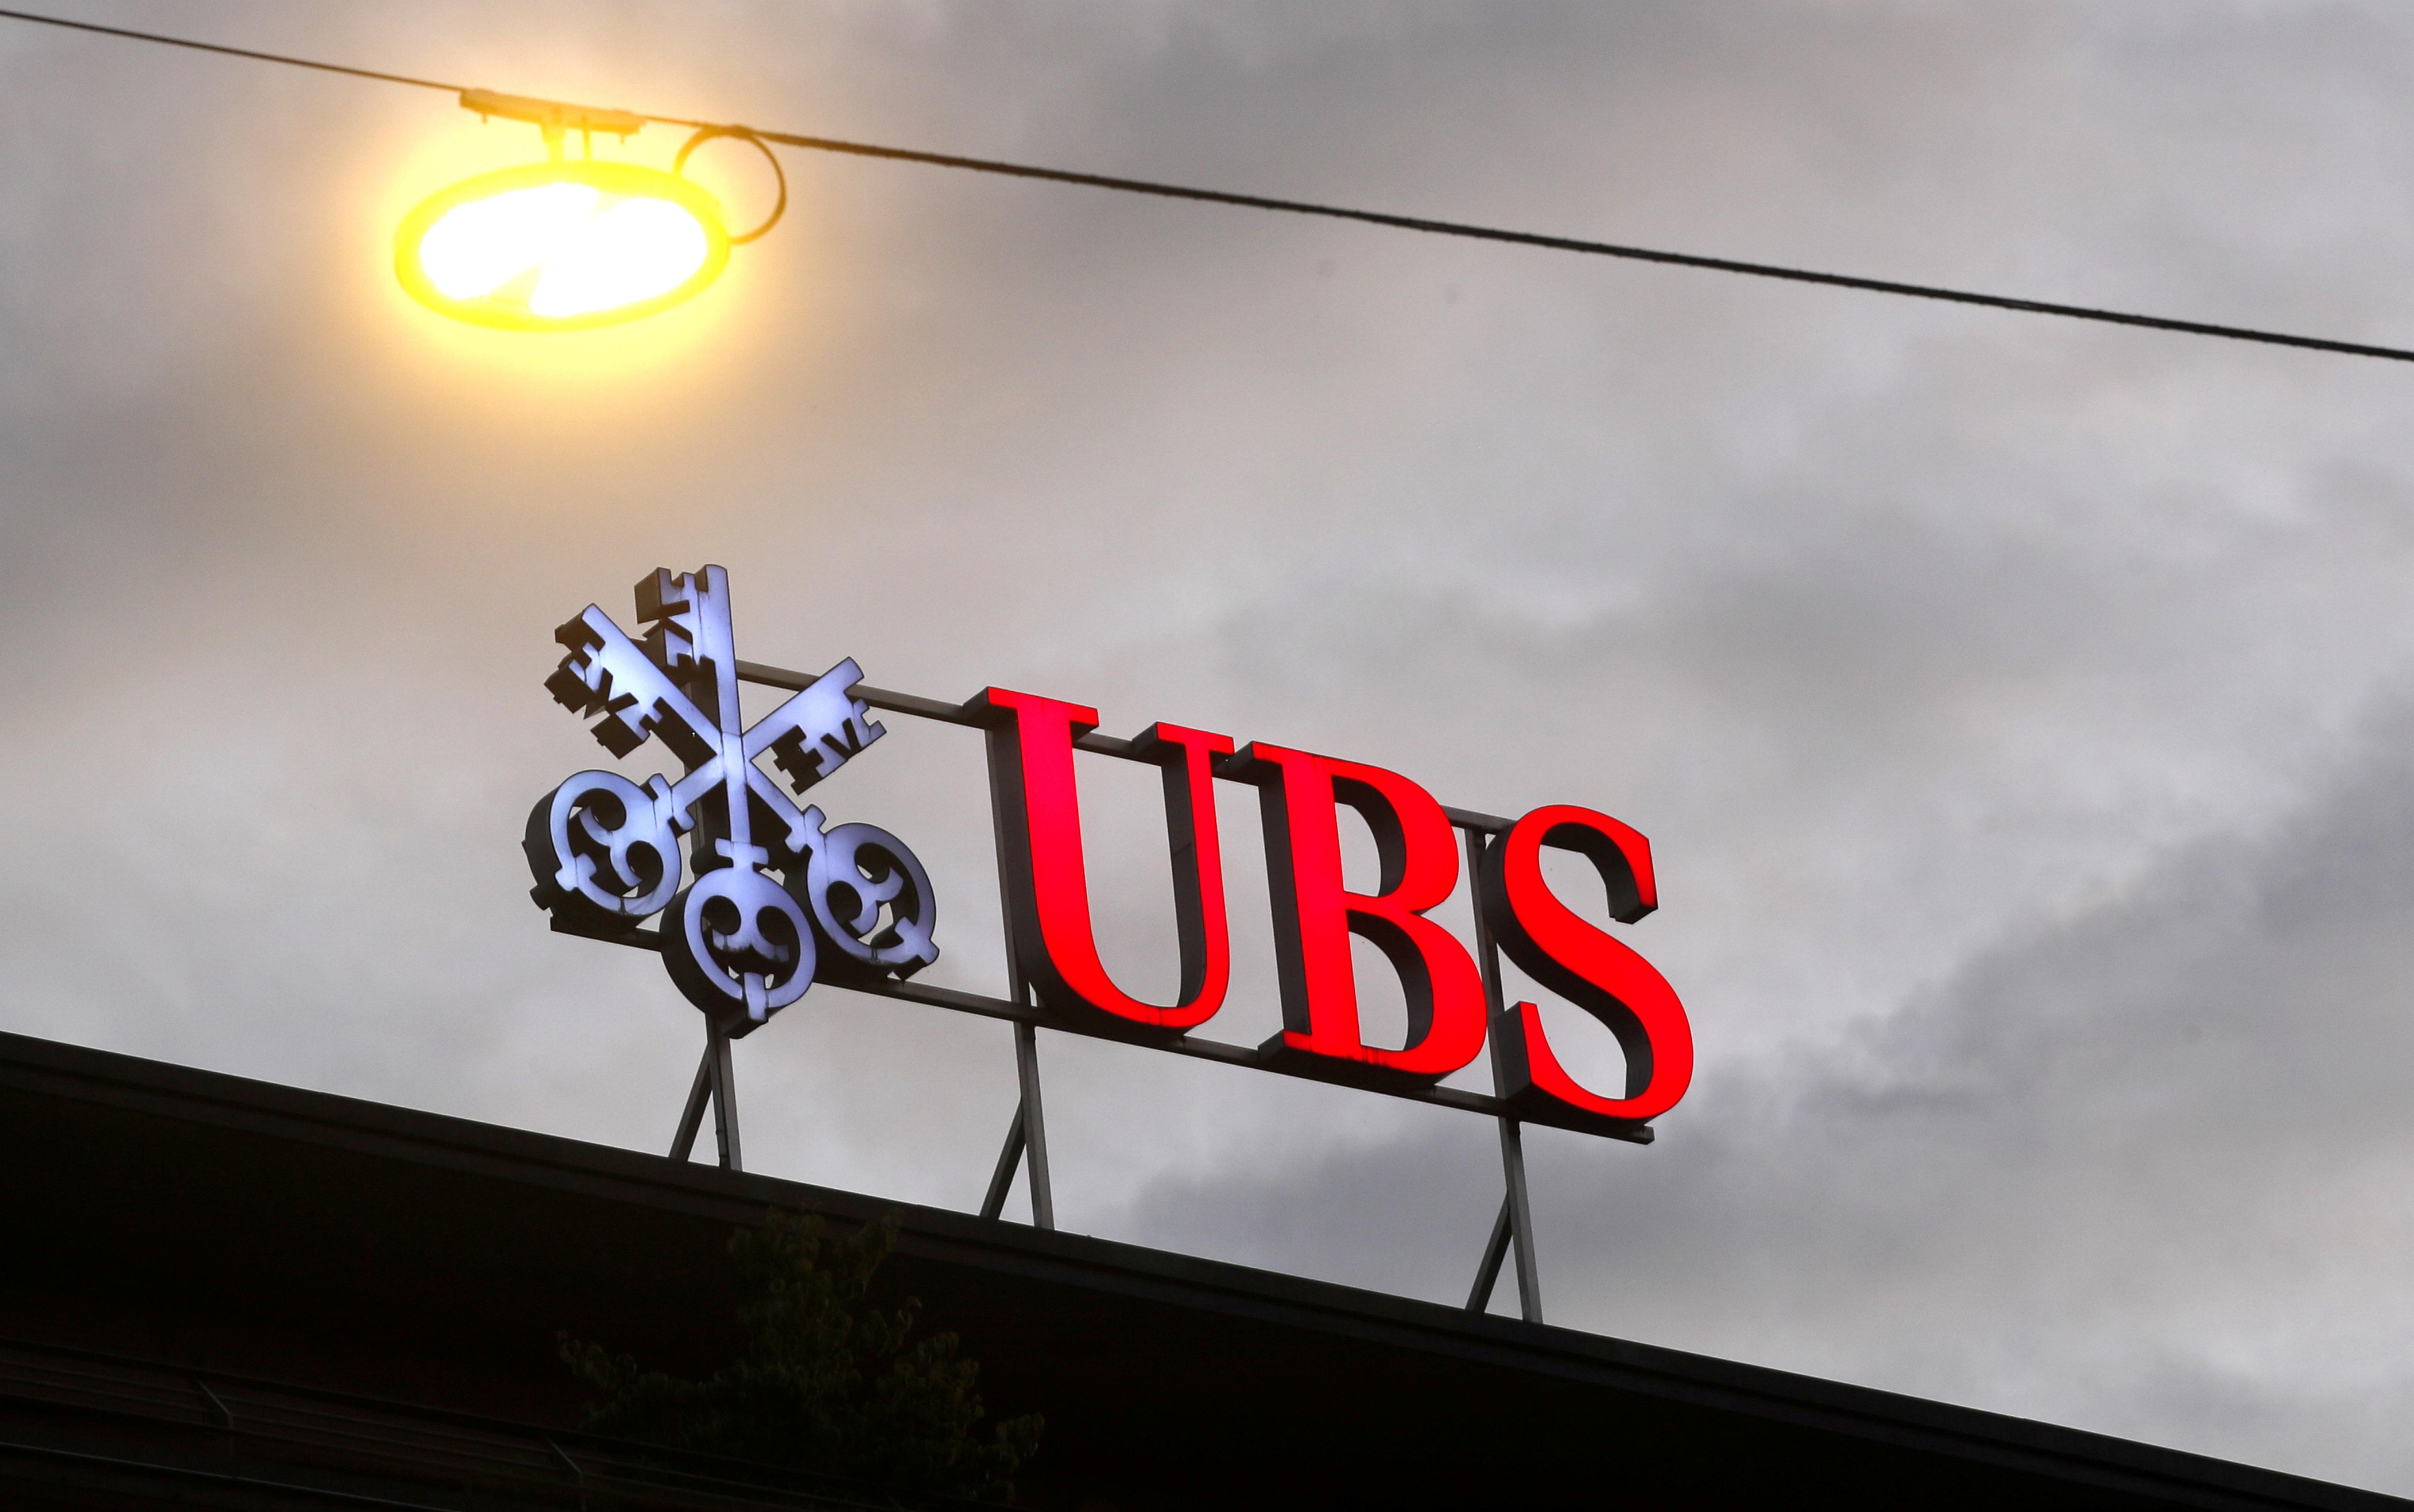 The logo of Swiss bank UBS is seen at a branch office in Zurich, Switzerland June 22, 2020. REUTERS/Arnd Wiegmann